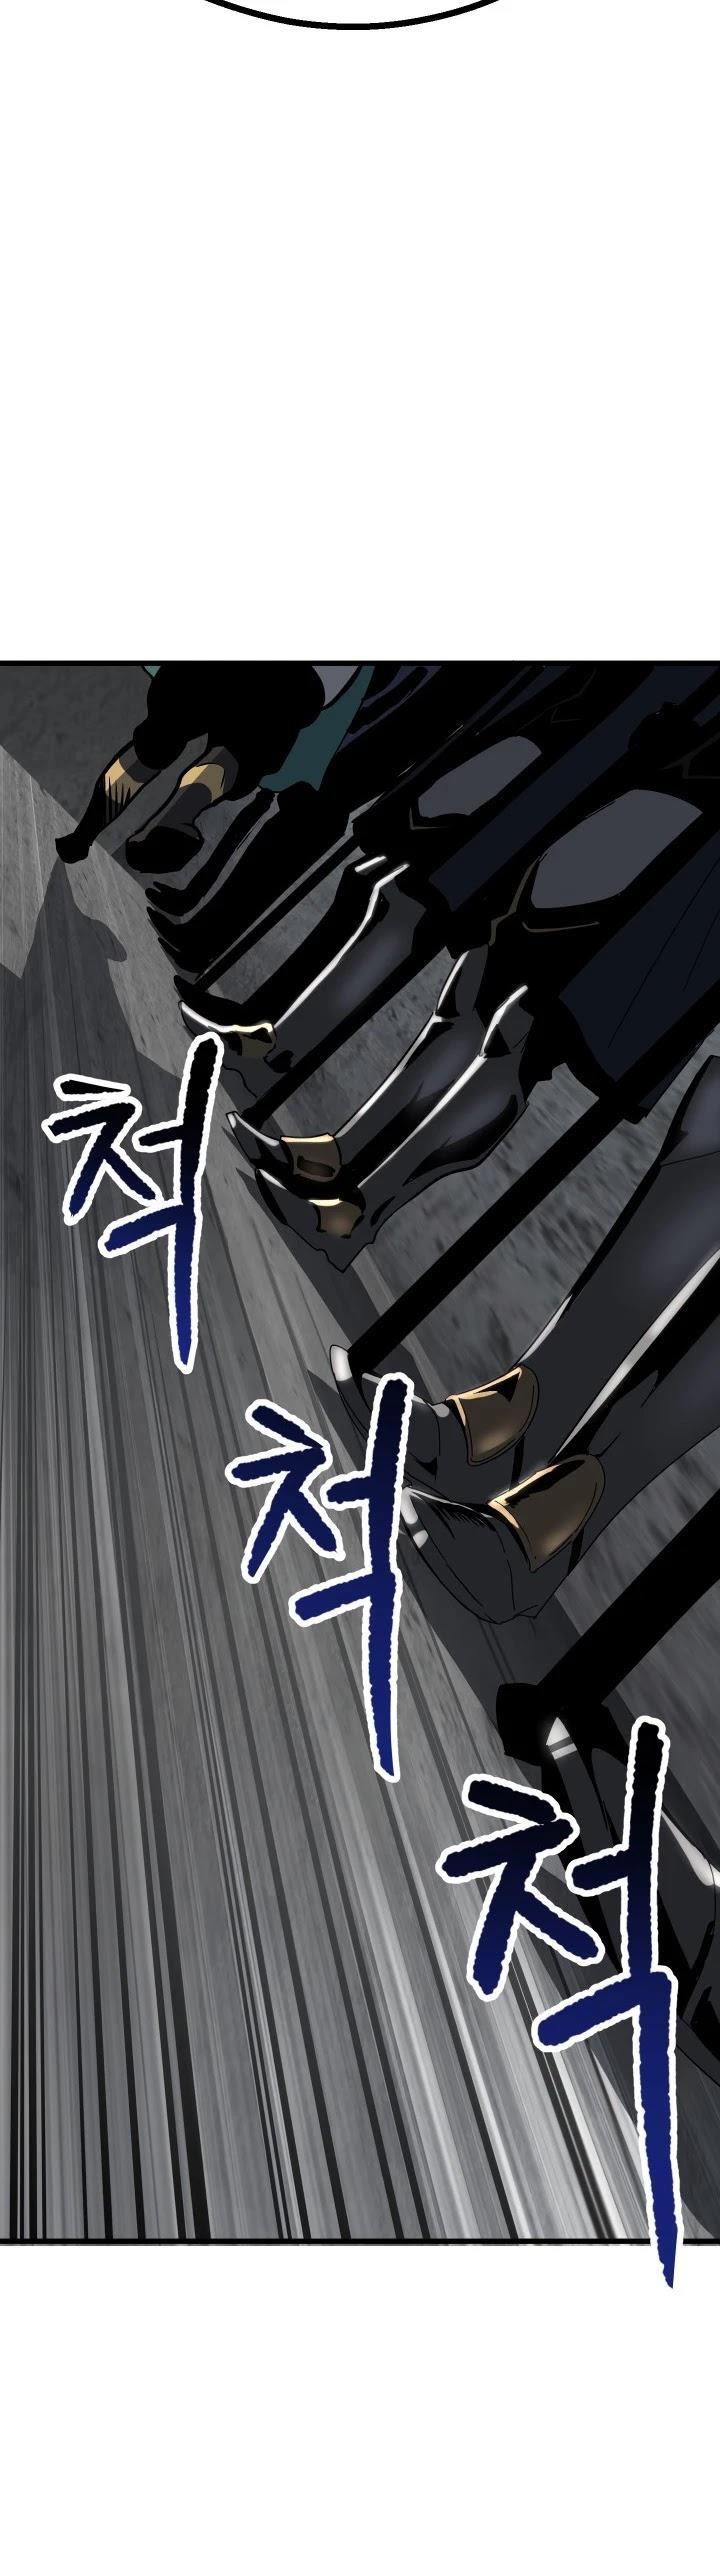 Survival Story Of A Sword King In A Fantasy World Chapter 53 page 30 - Mangakakalots.com